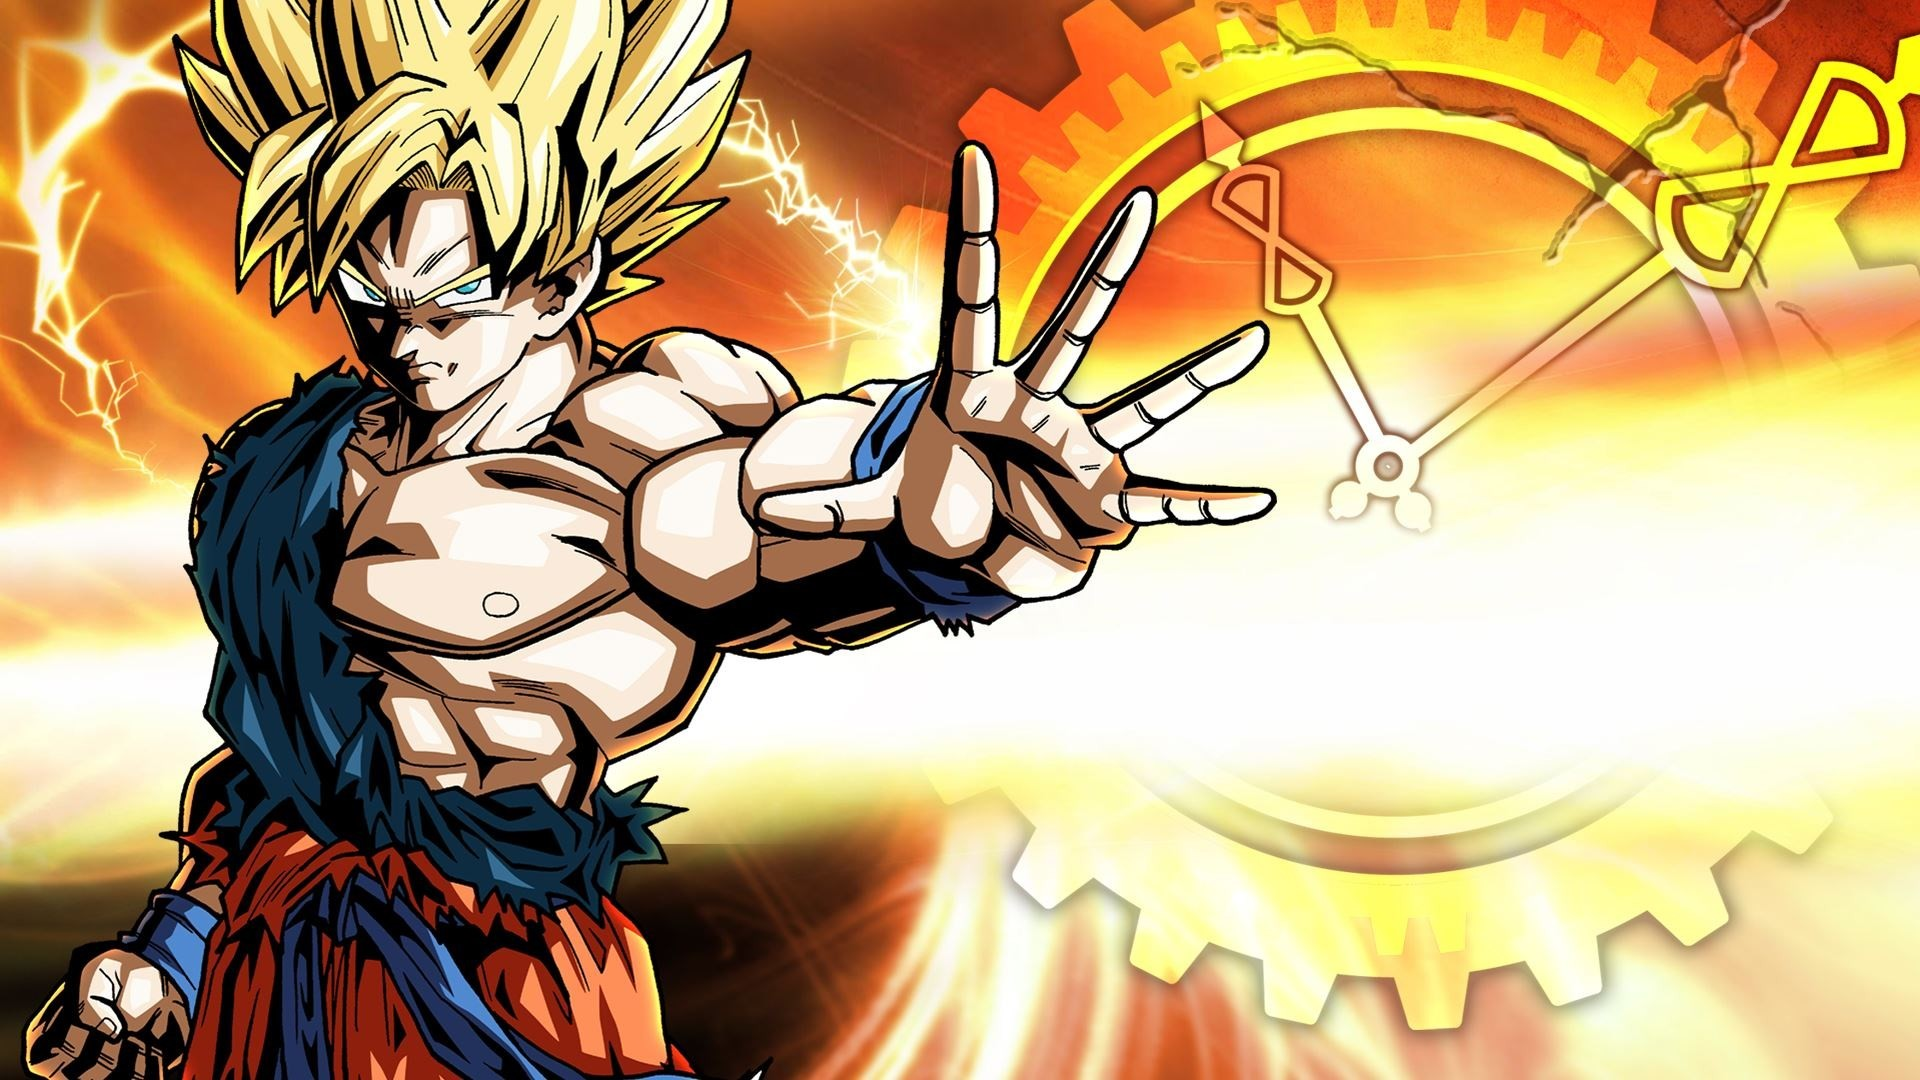 Dragon Ball Z Wallpaper Hd 69 Images